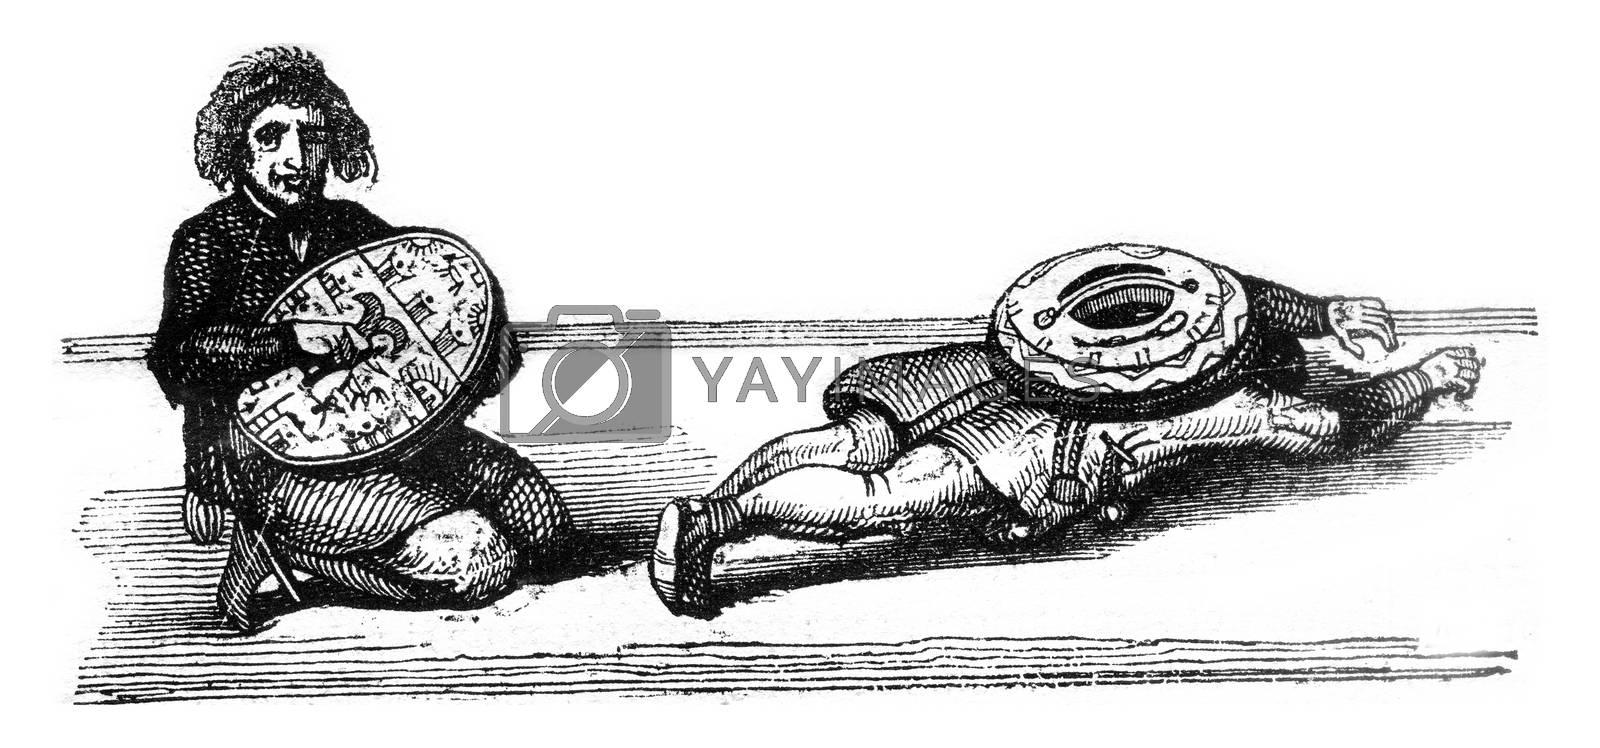 Consultation runboom, vintage engraved illustration. Magasin Pittoresque 1841.